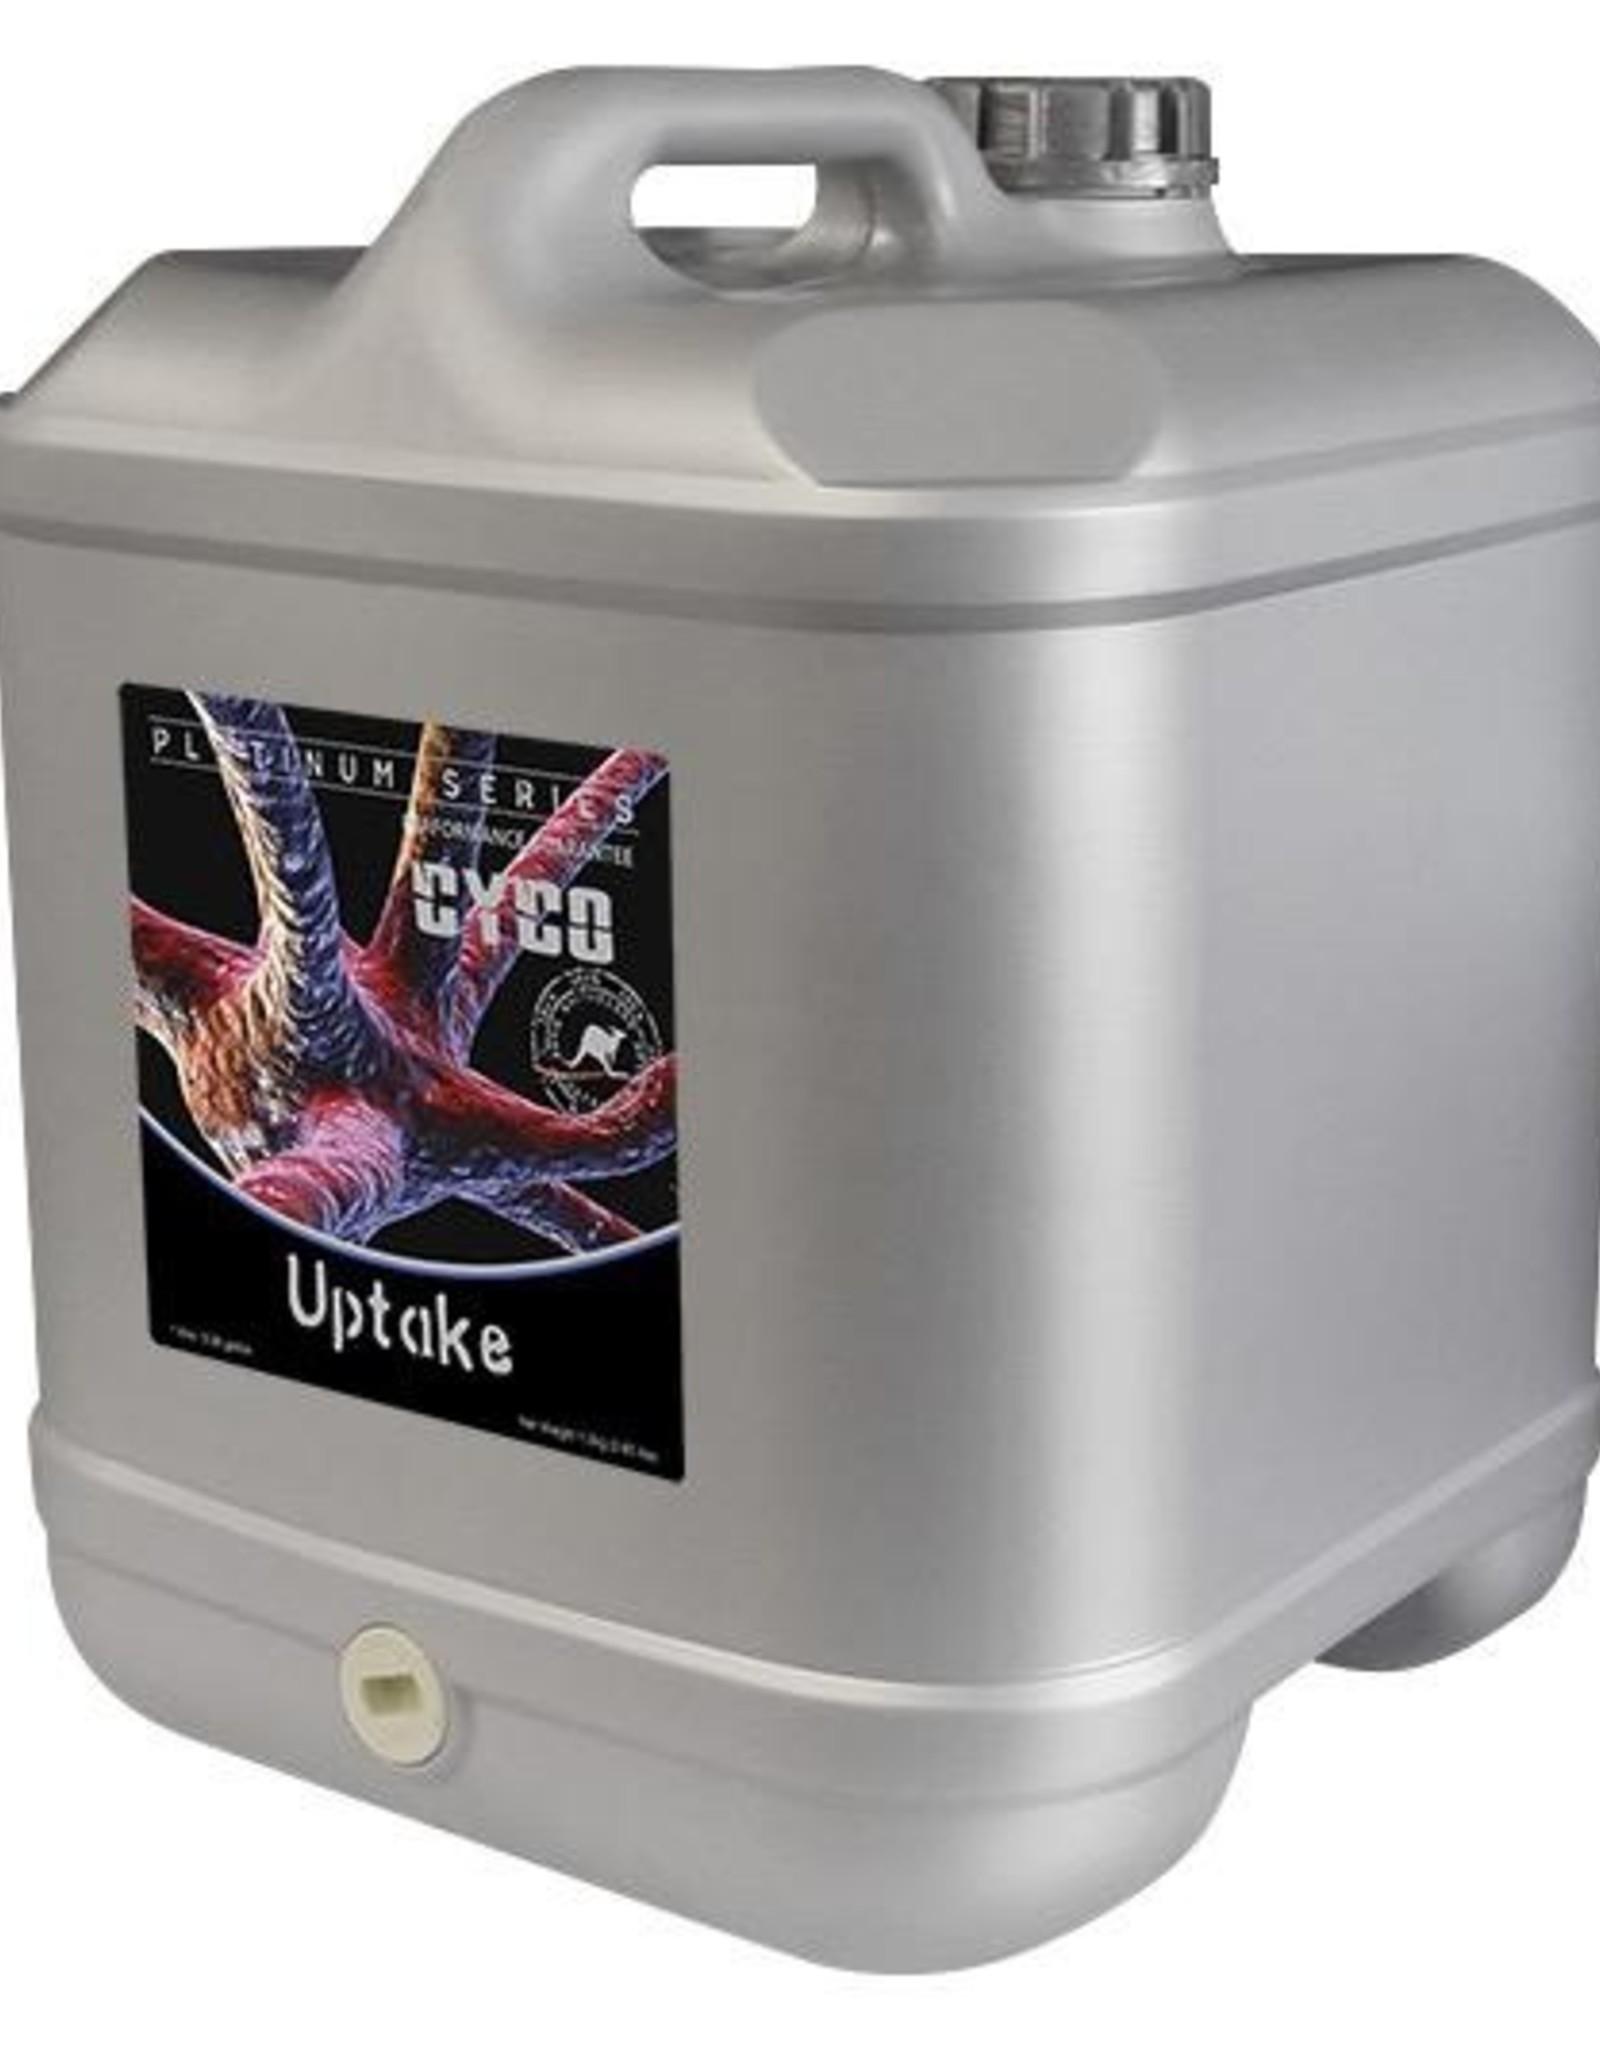 CYCO CYCO Uptake 20 Liter